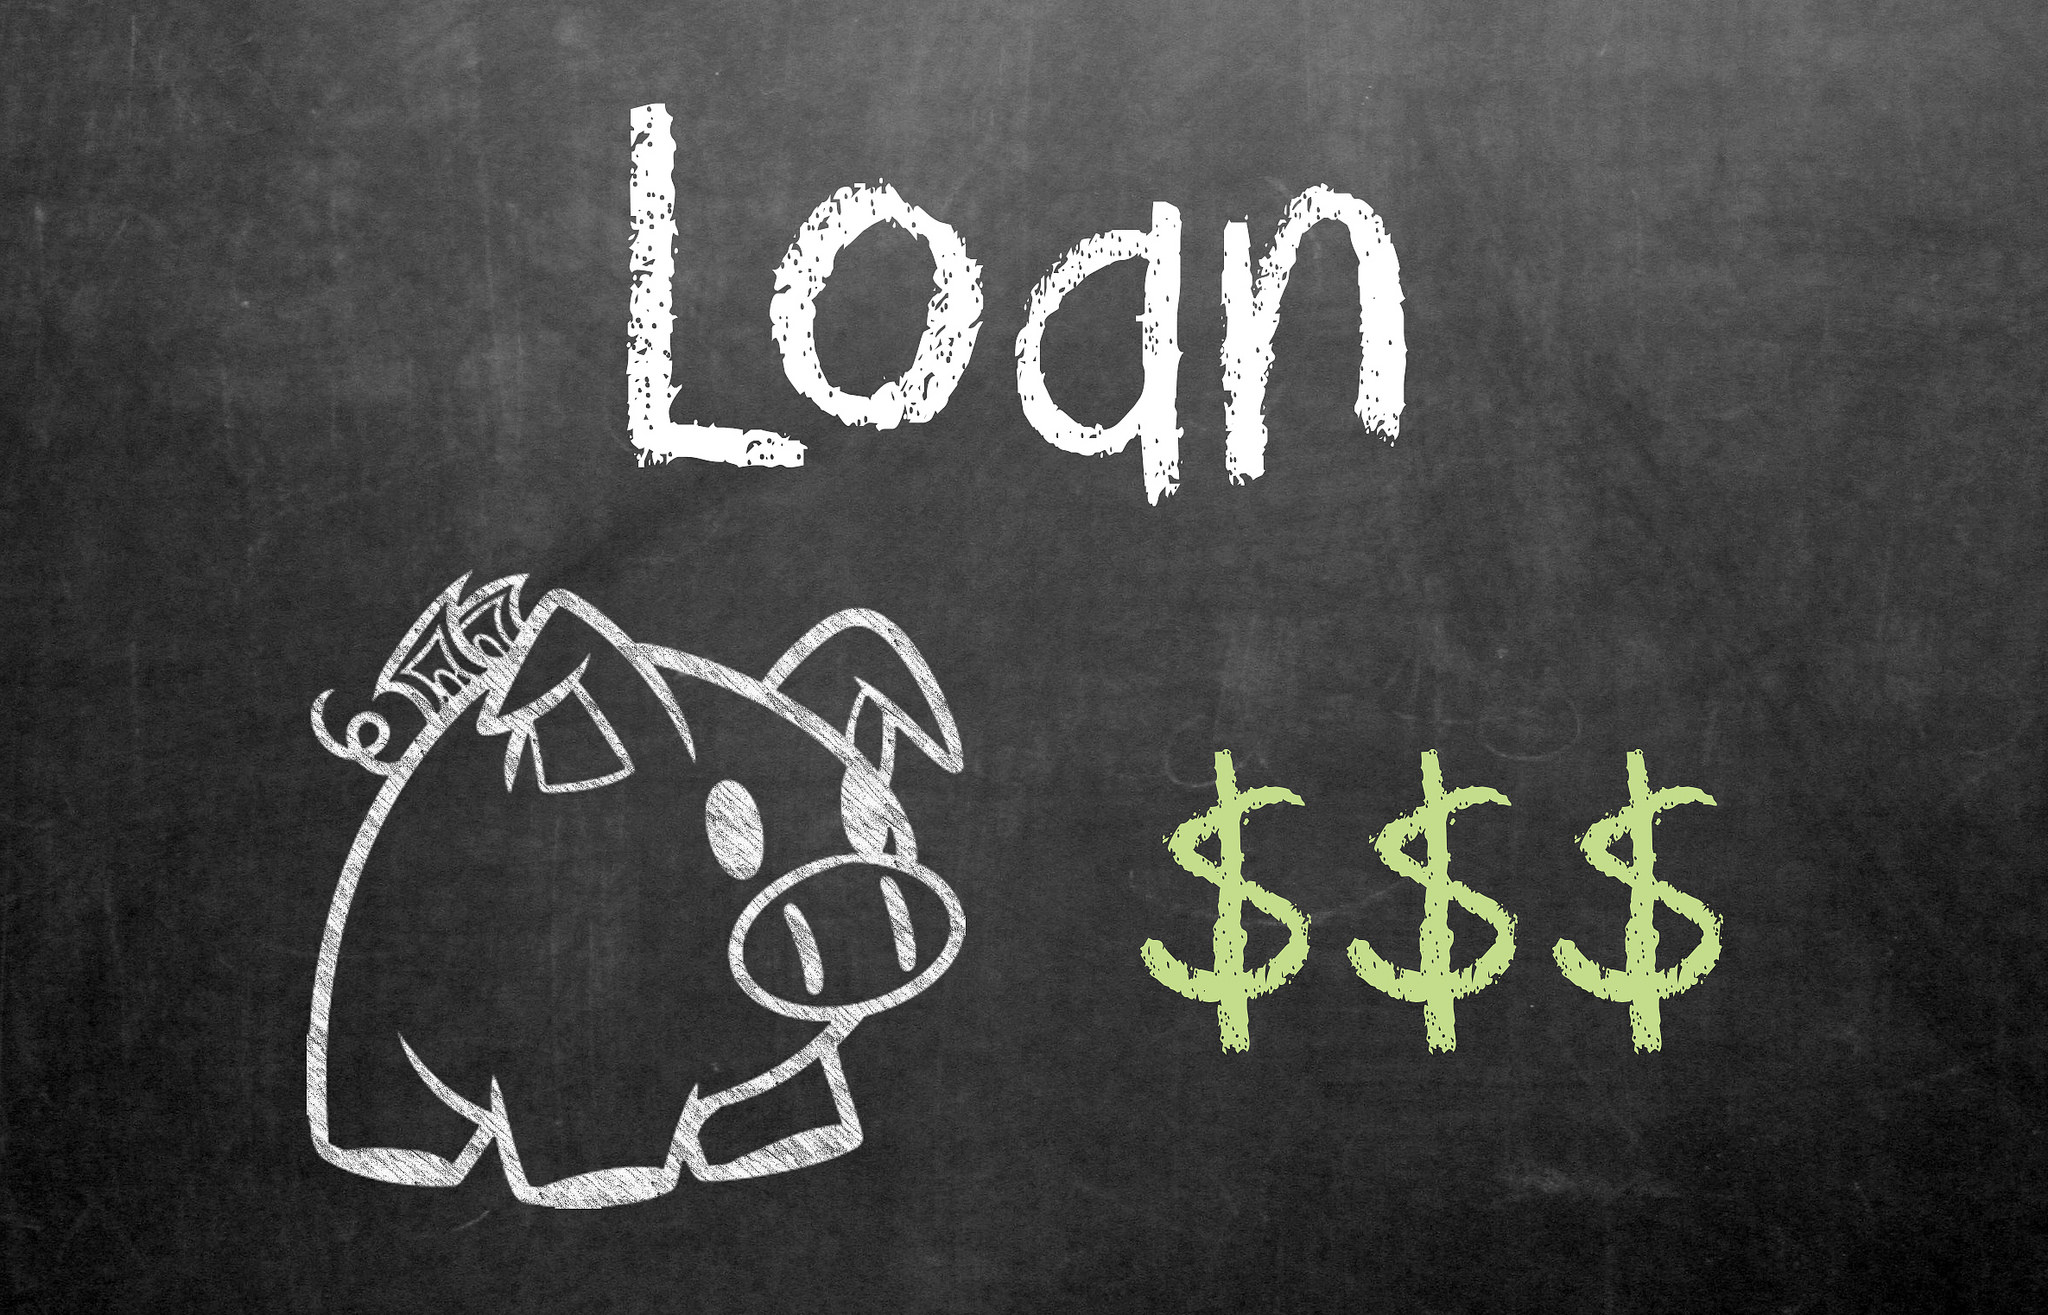 Technical Debt Calculation - Financial Debt Comparison